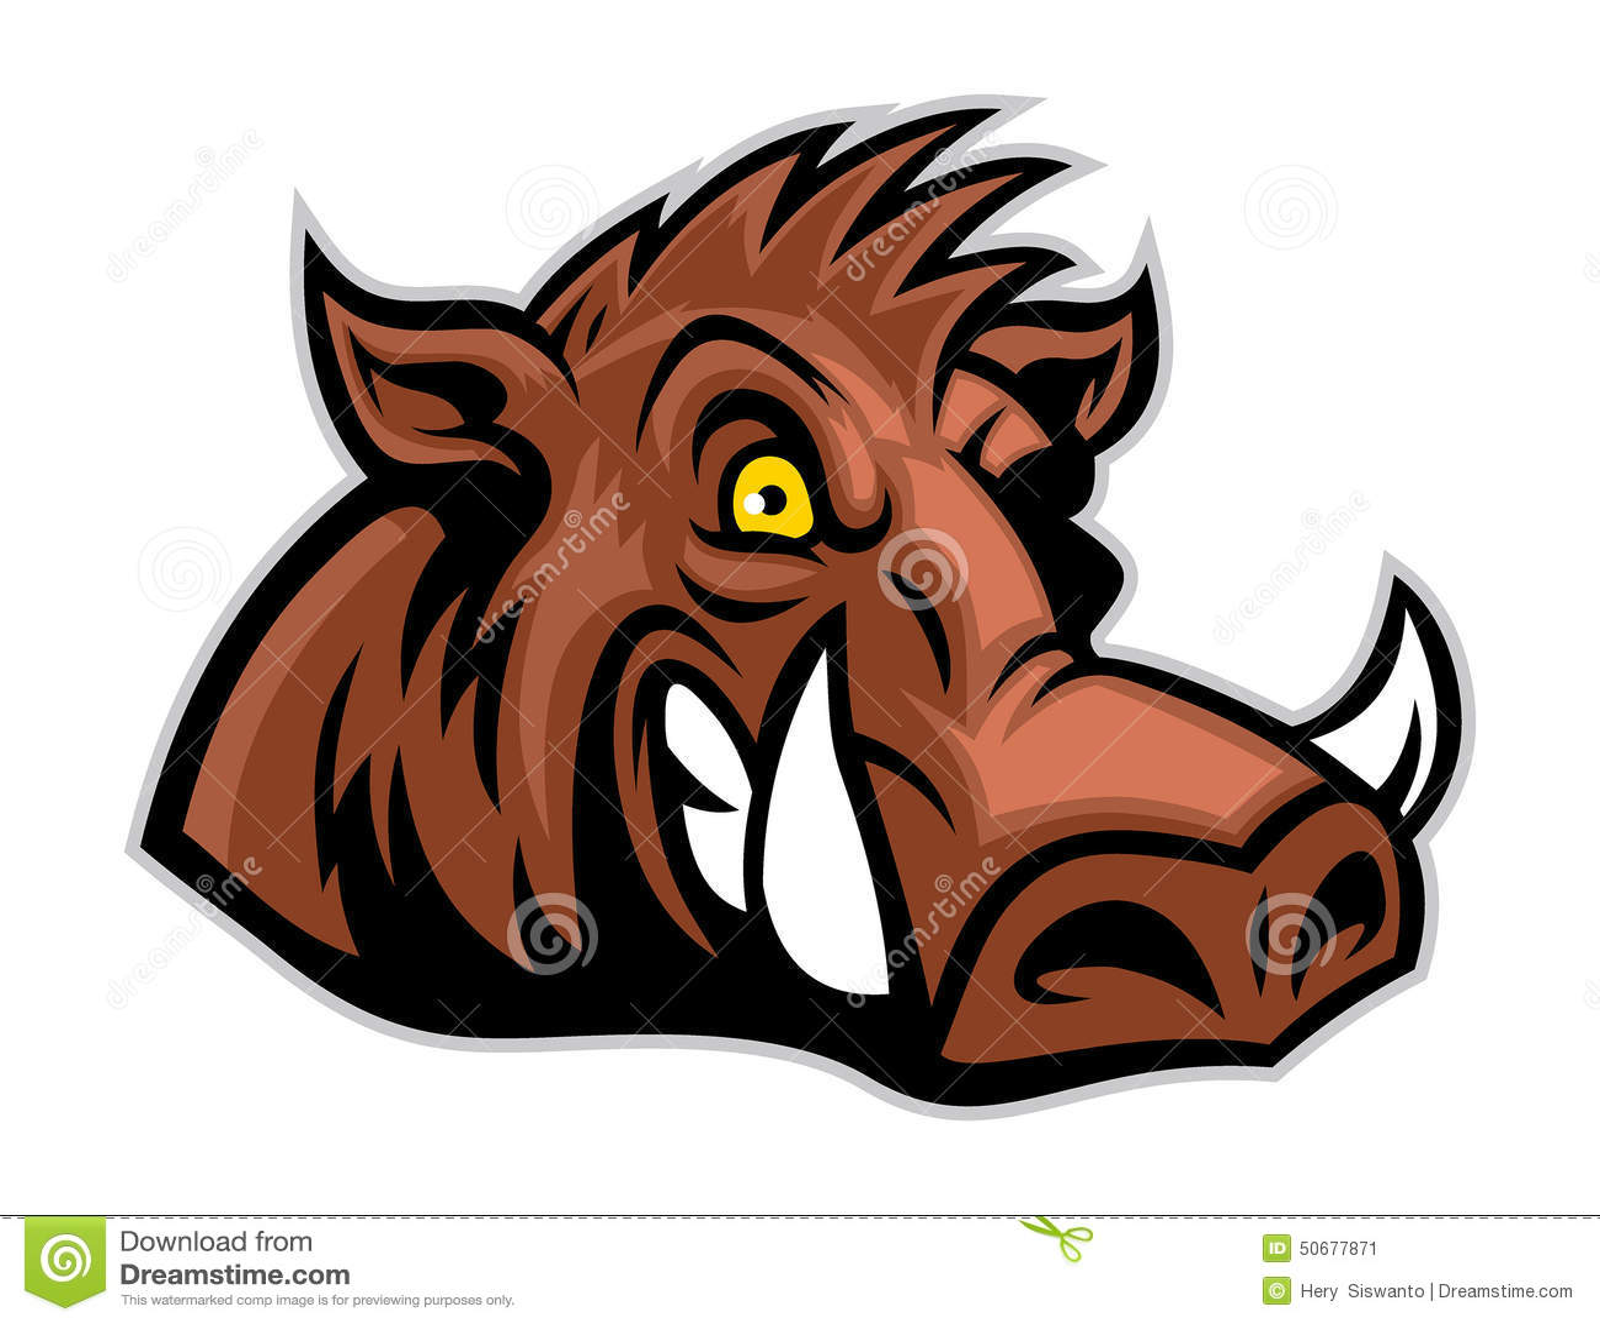 Download 狂放的肉猪头 向量例证. 插画 包括有 学院, 骄傲, 艺术, 力量, 小组, 勇气, 敌意, 吉祥人, 灰色 - 50677871